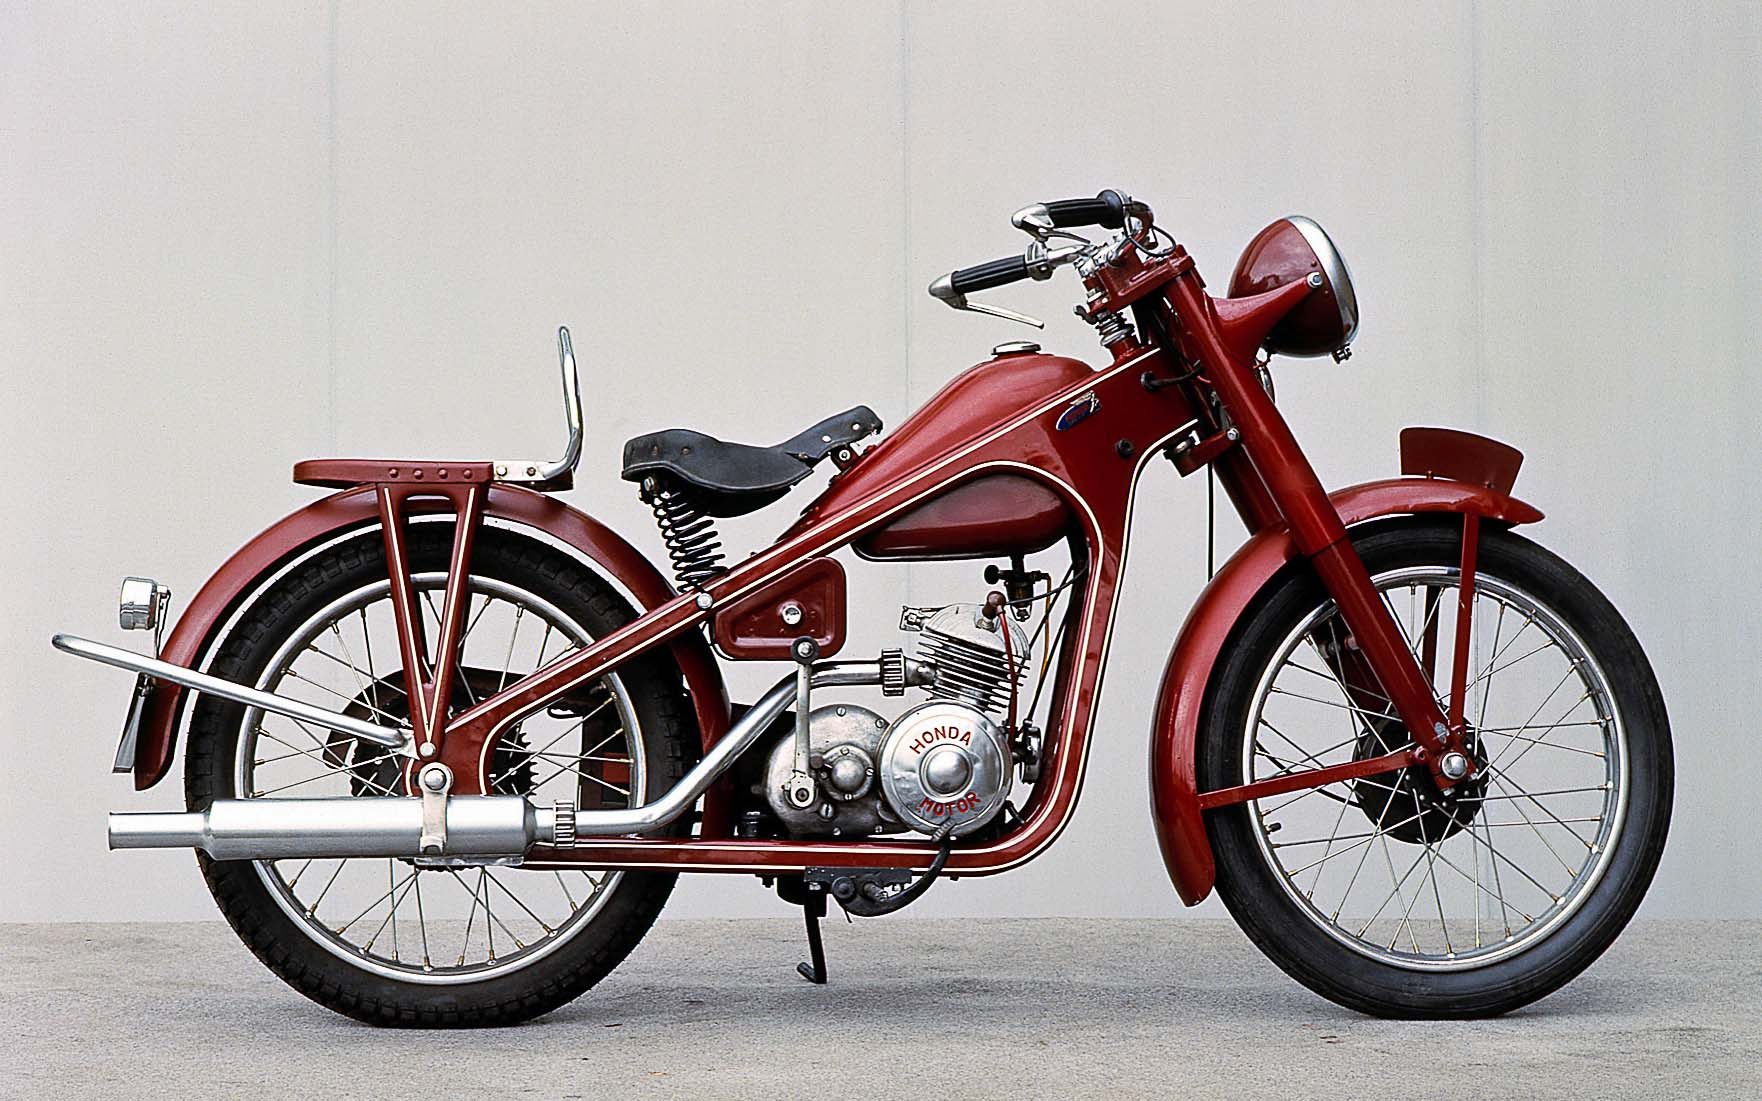 Honda Dream D aus dem Jahr 1949